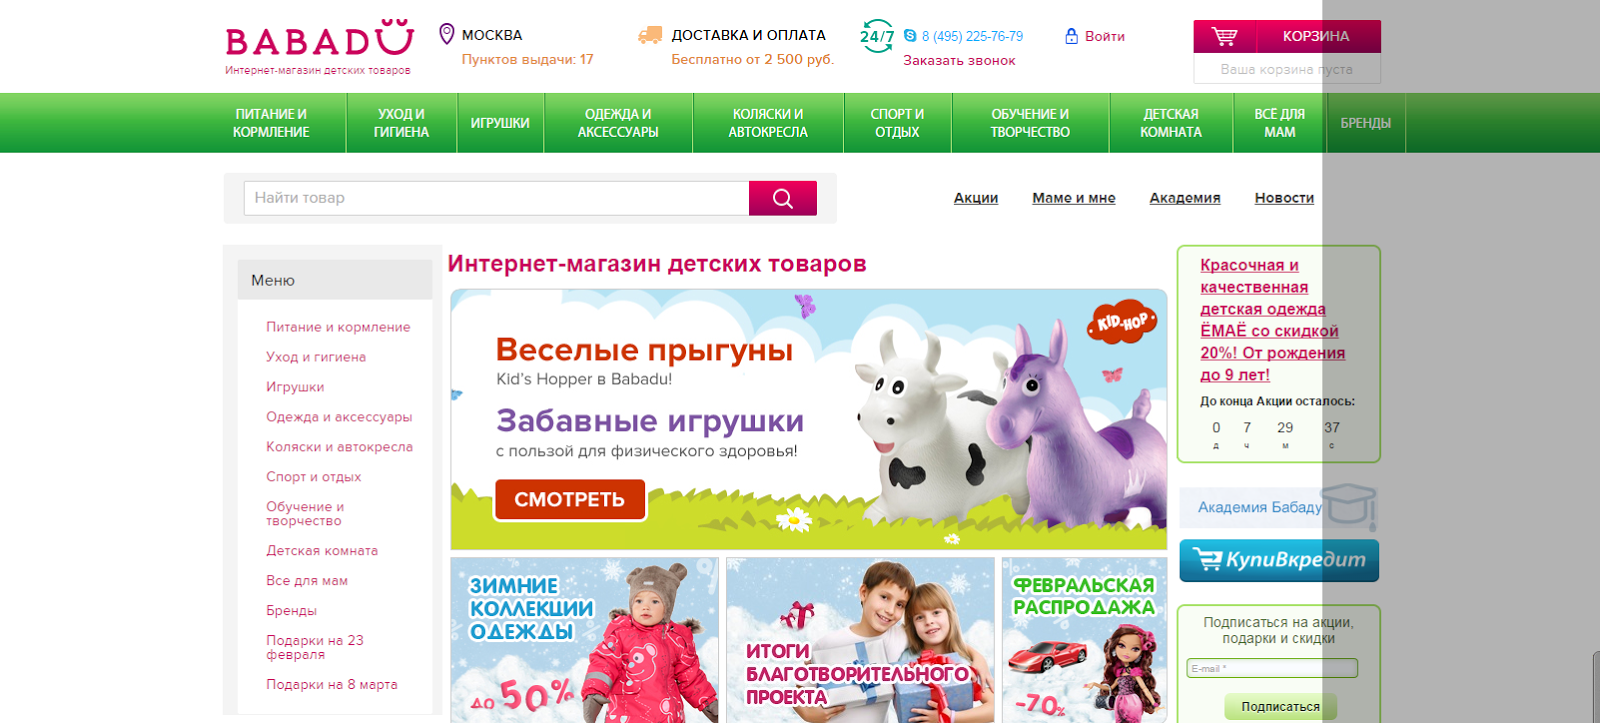 Сайты зарубежных рунеток 12 фотография